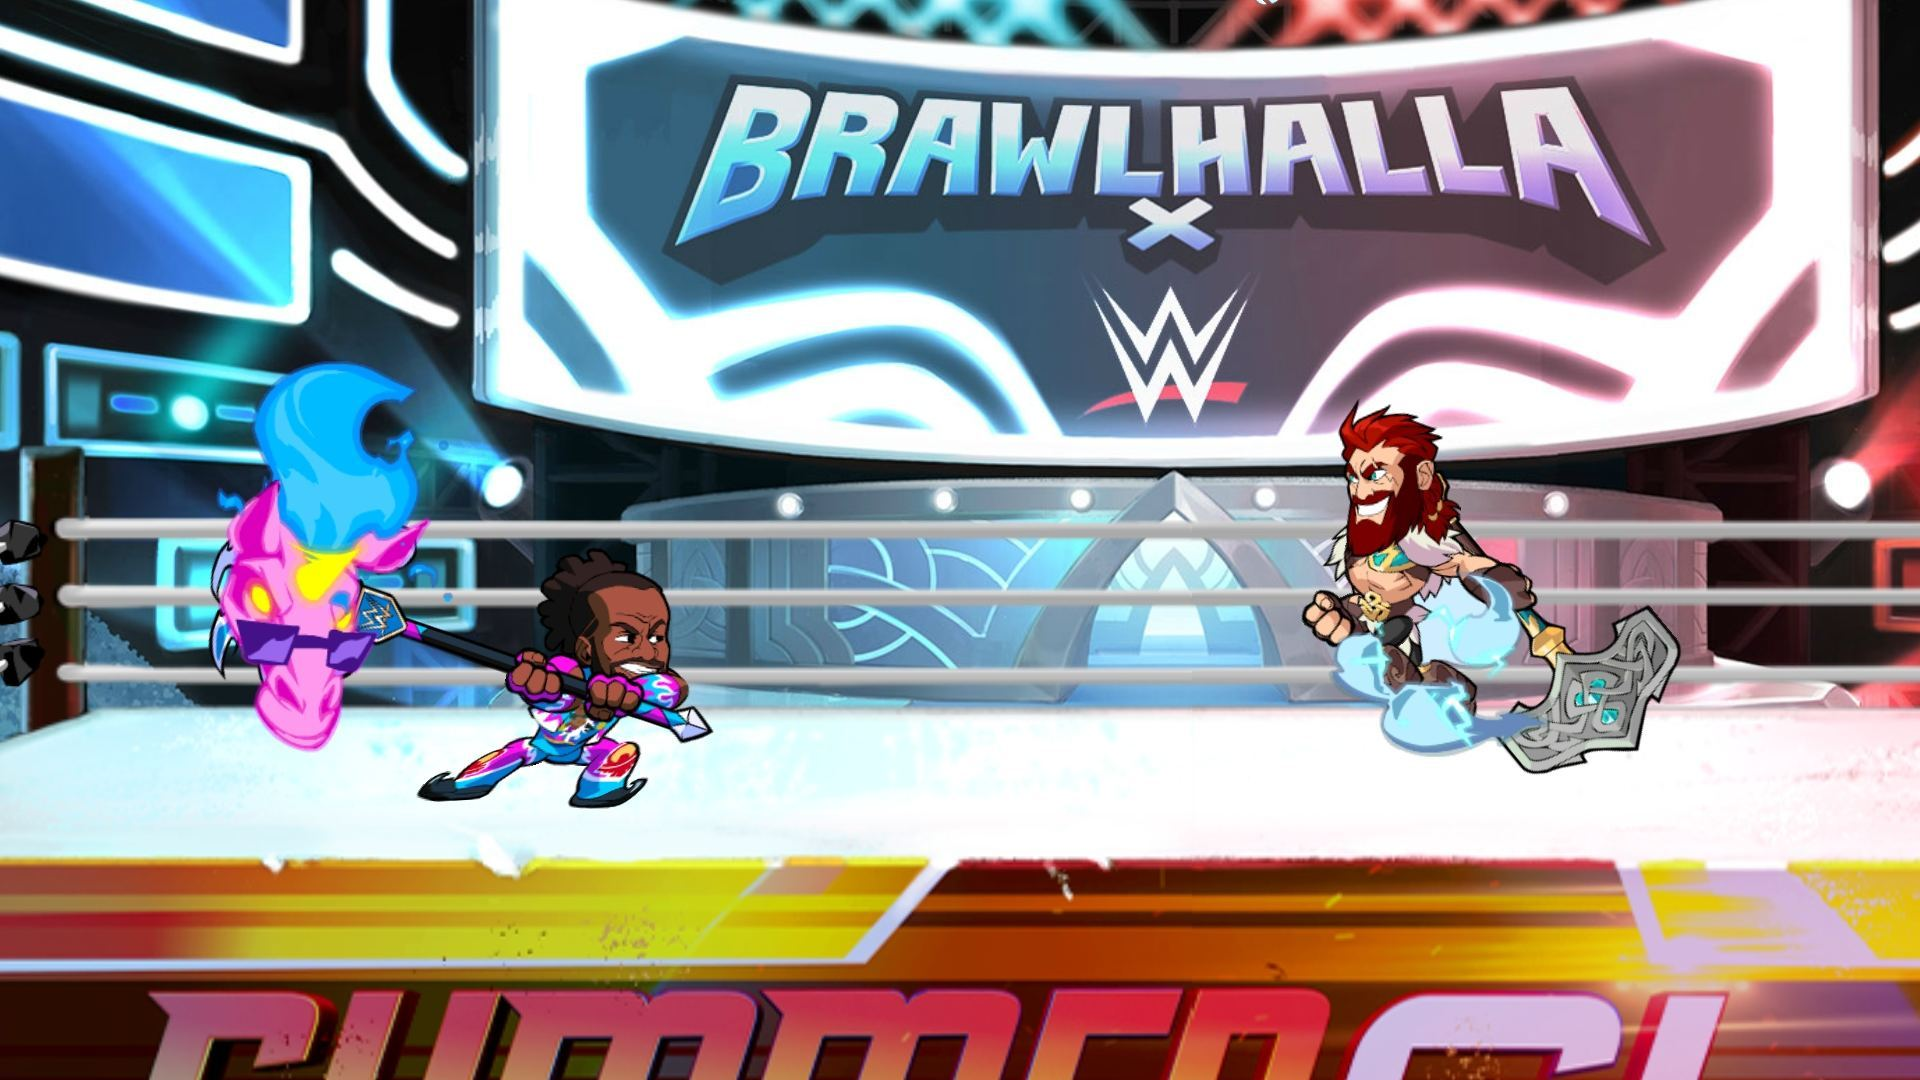 Brawlhalla WWE Event – XAVIER_WOODS_2